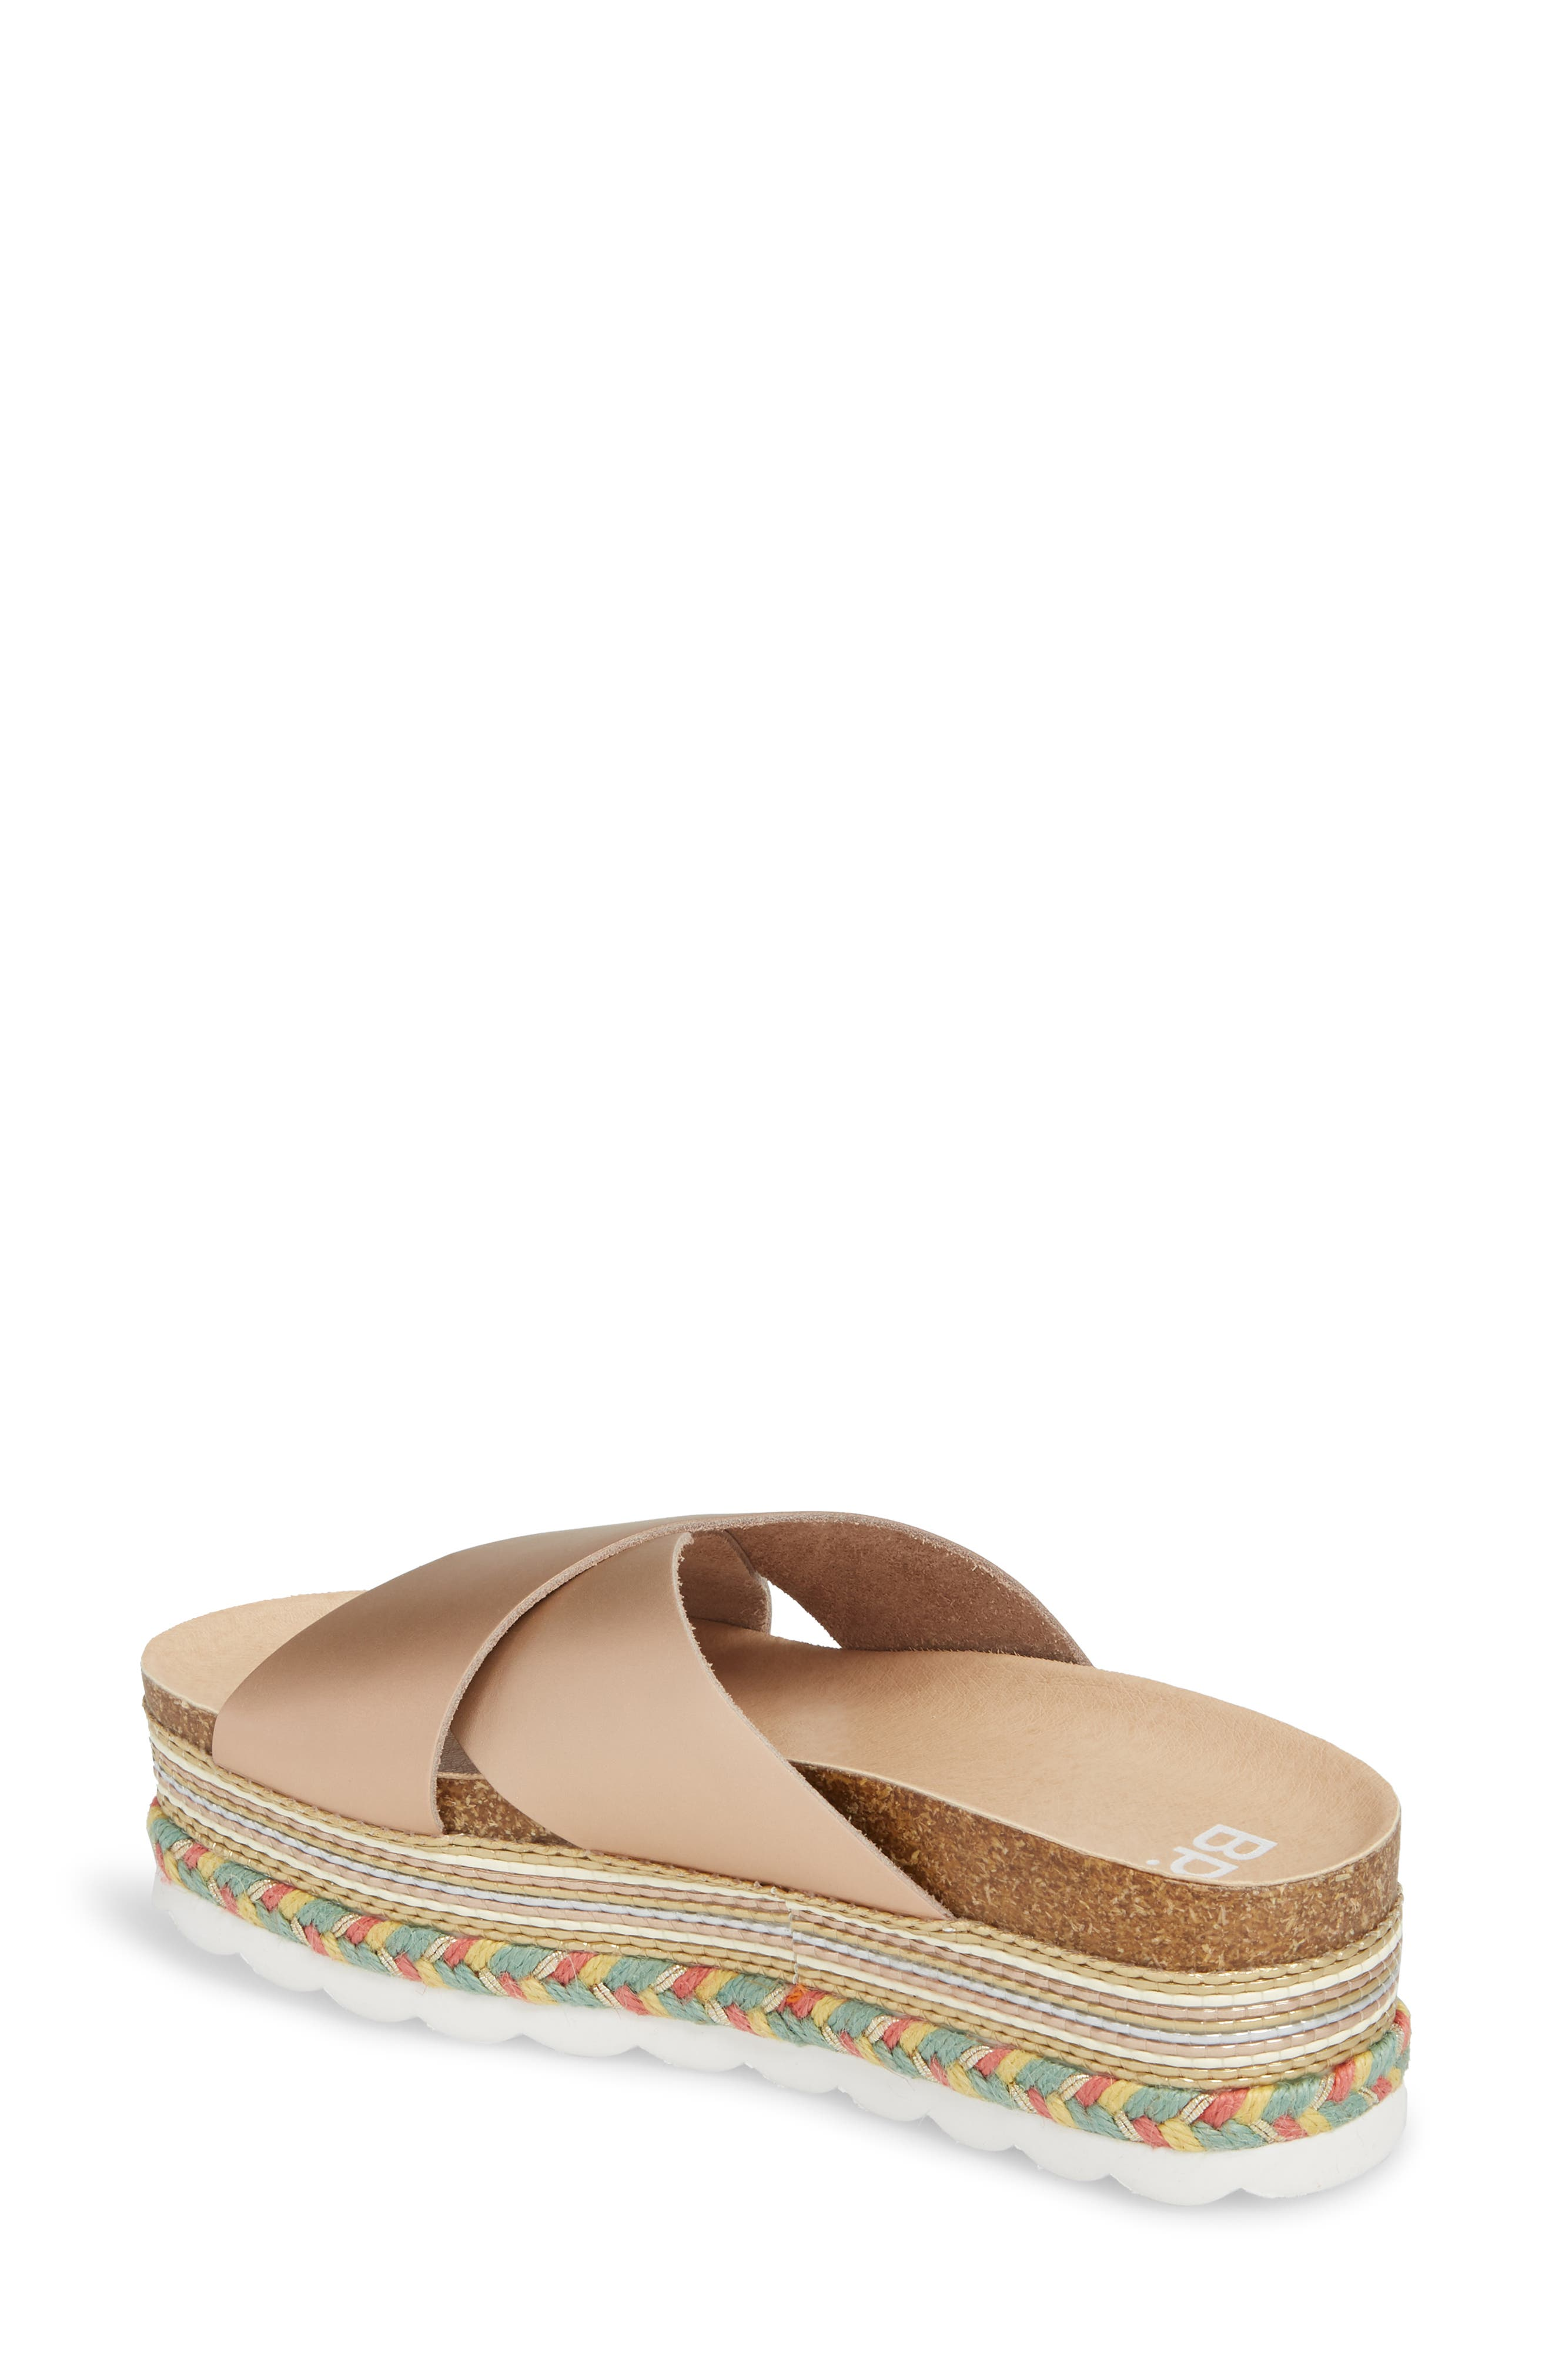 Torri Platform Slide Sandal,                             Alternate thumbnail 2, color,                             Rose Gold Leather